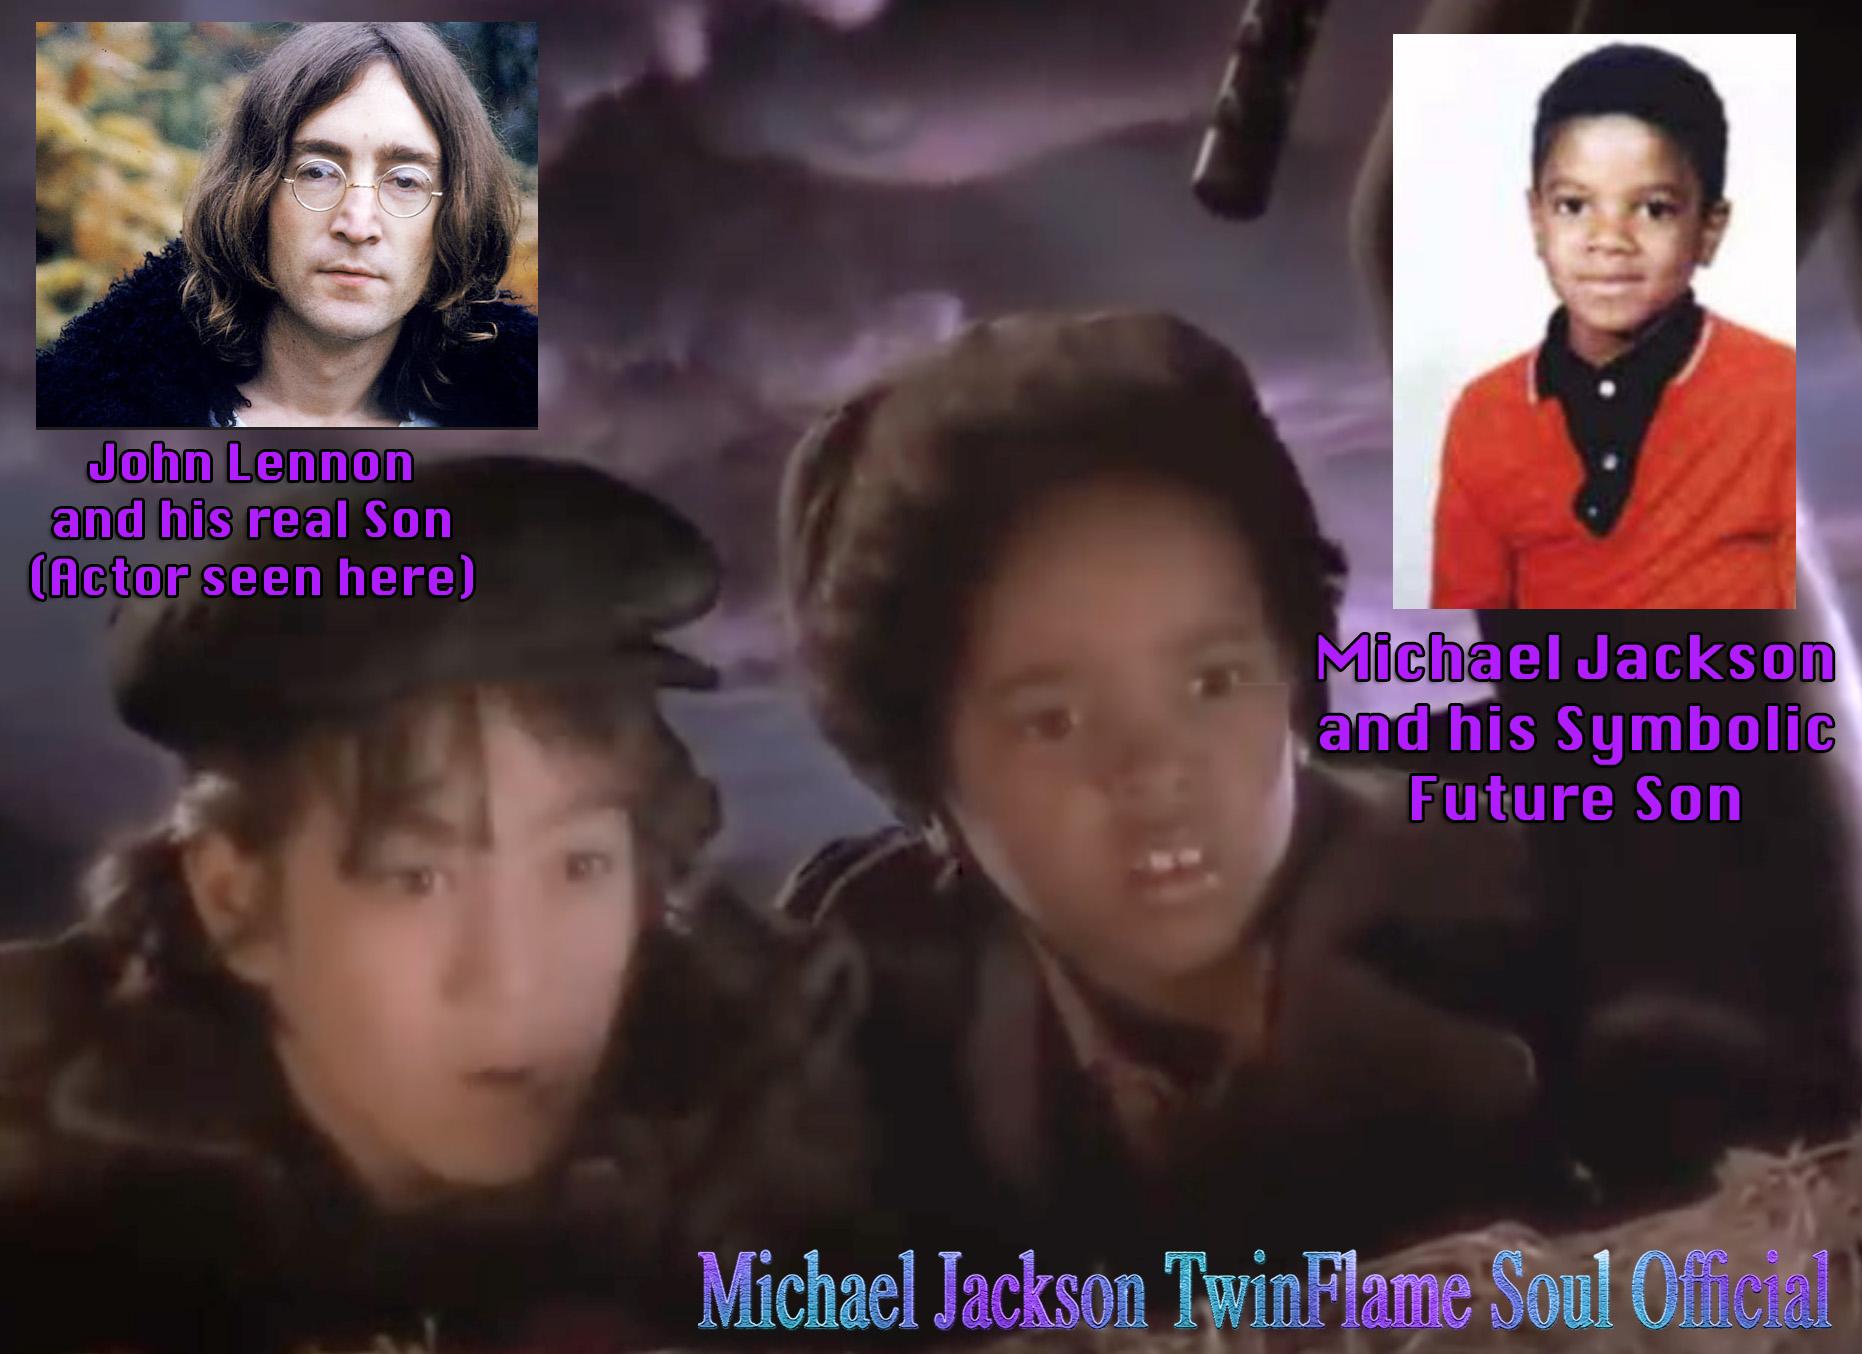 Michael Jacksons Moonwalker Movie Kids Symbolic Children Of The Stars Here Future Song